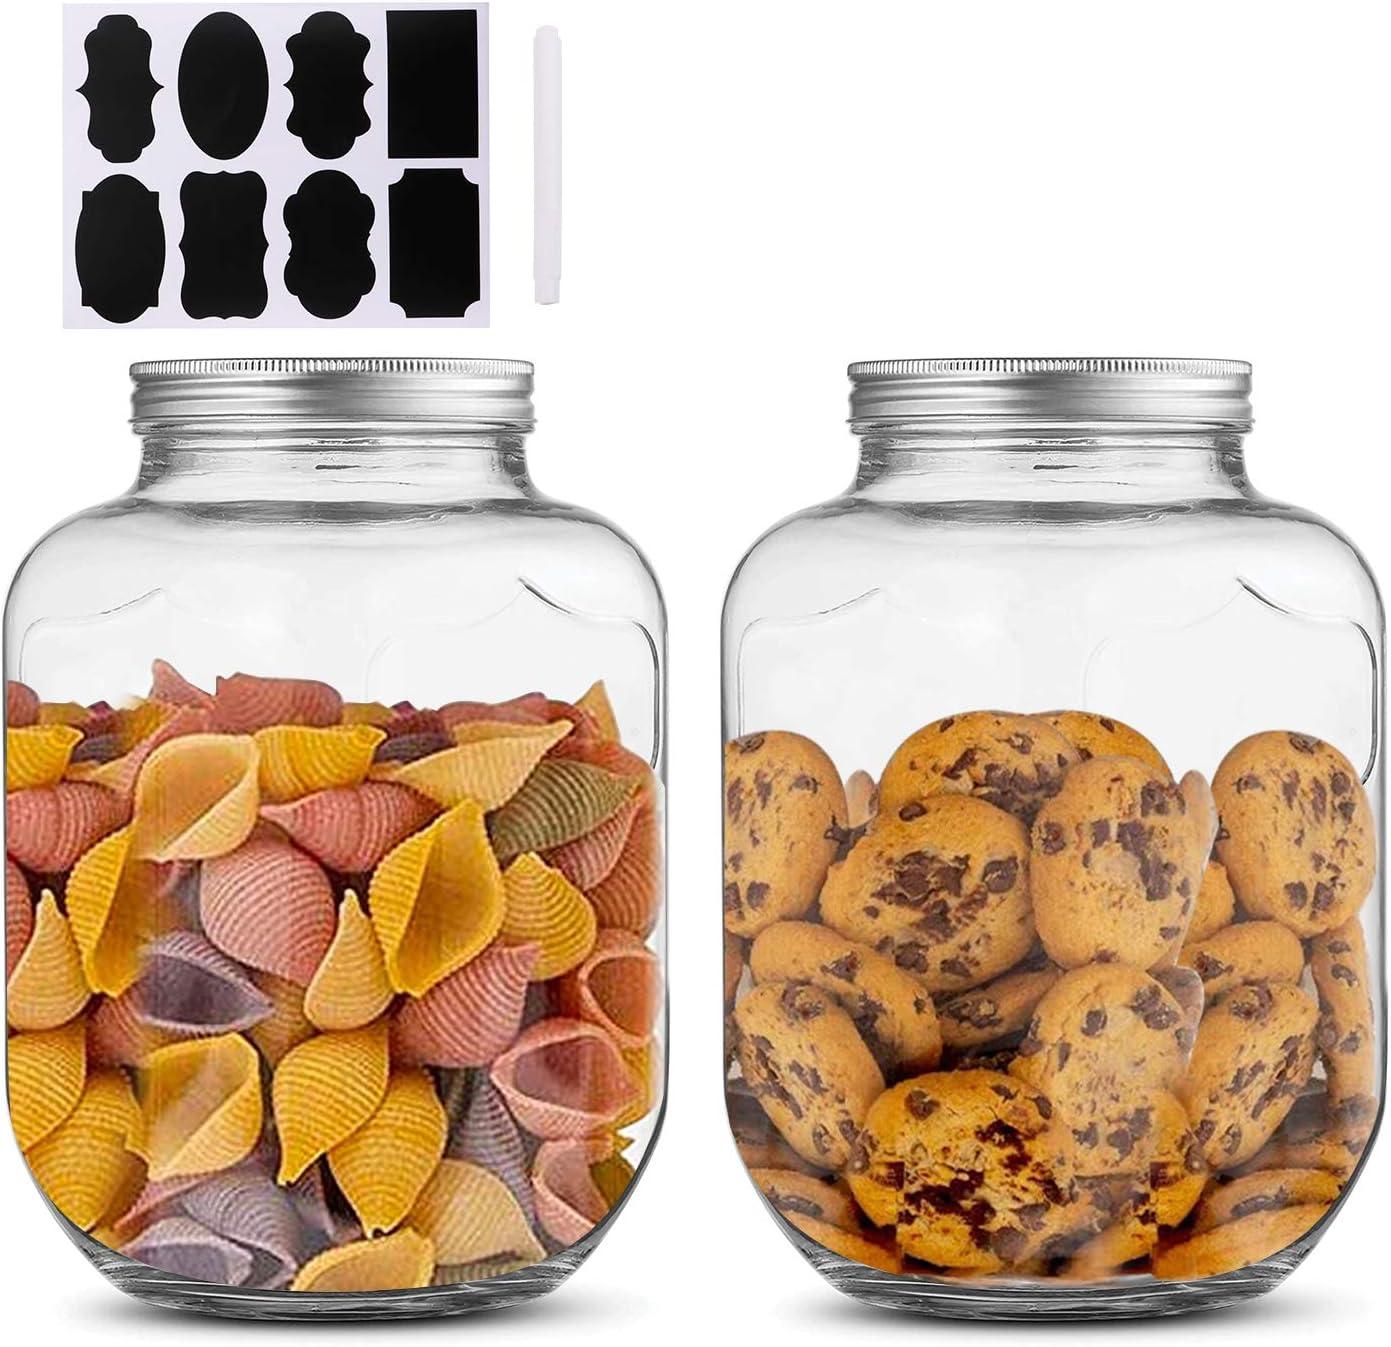 1 Gallon Max 73% OFF 4000ml Clear Mason Jar With Glass Airtight Raleigh Mall Jars Lids